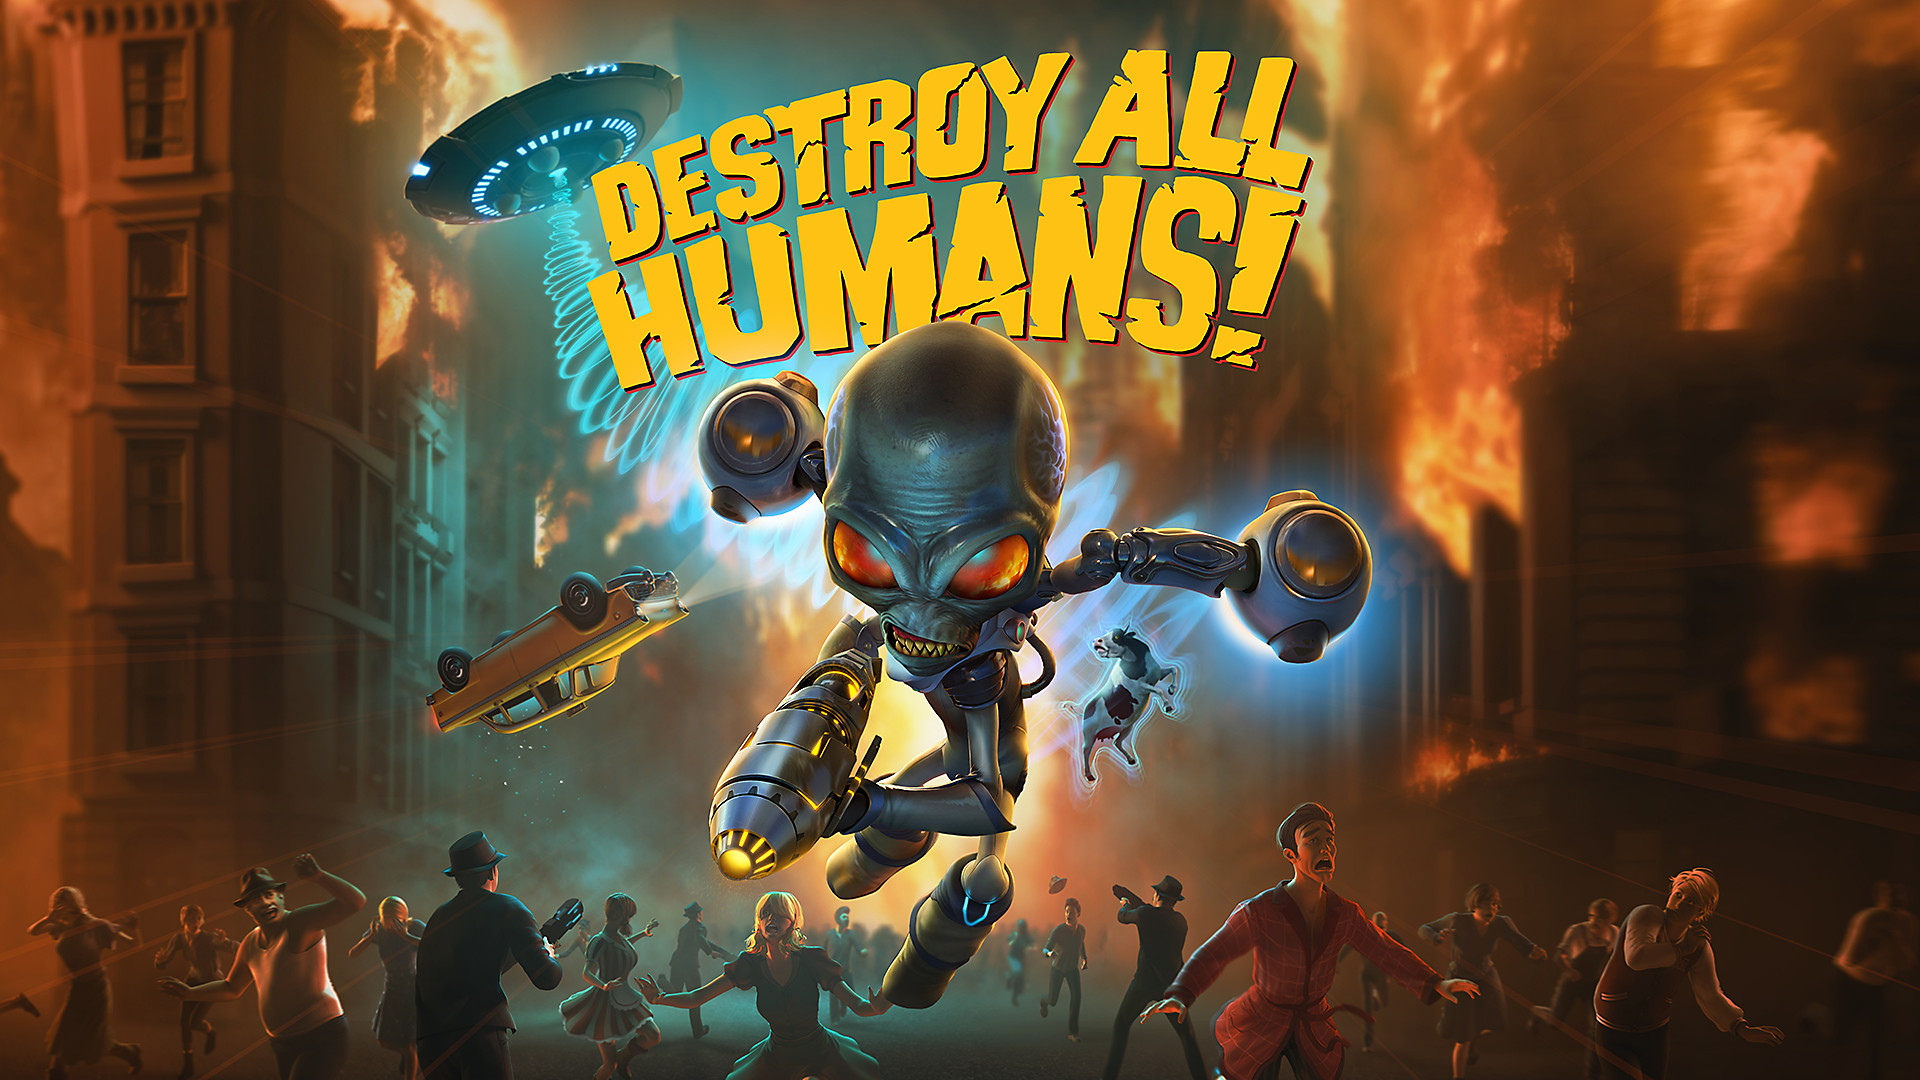 Destroy All Humans!(デストロイ オール ヒューマンズ!) Decorative Background